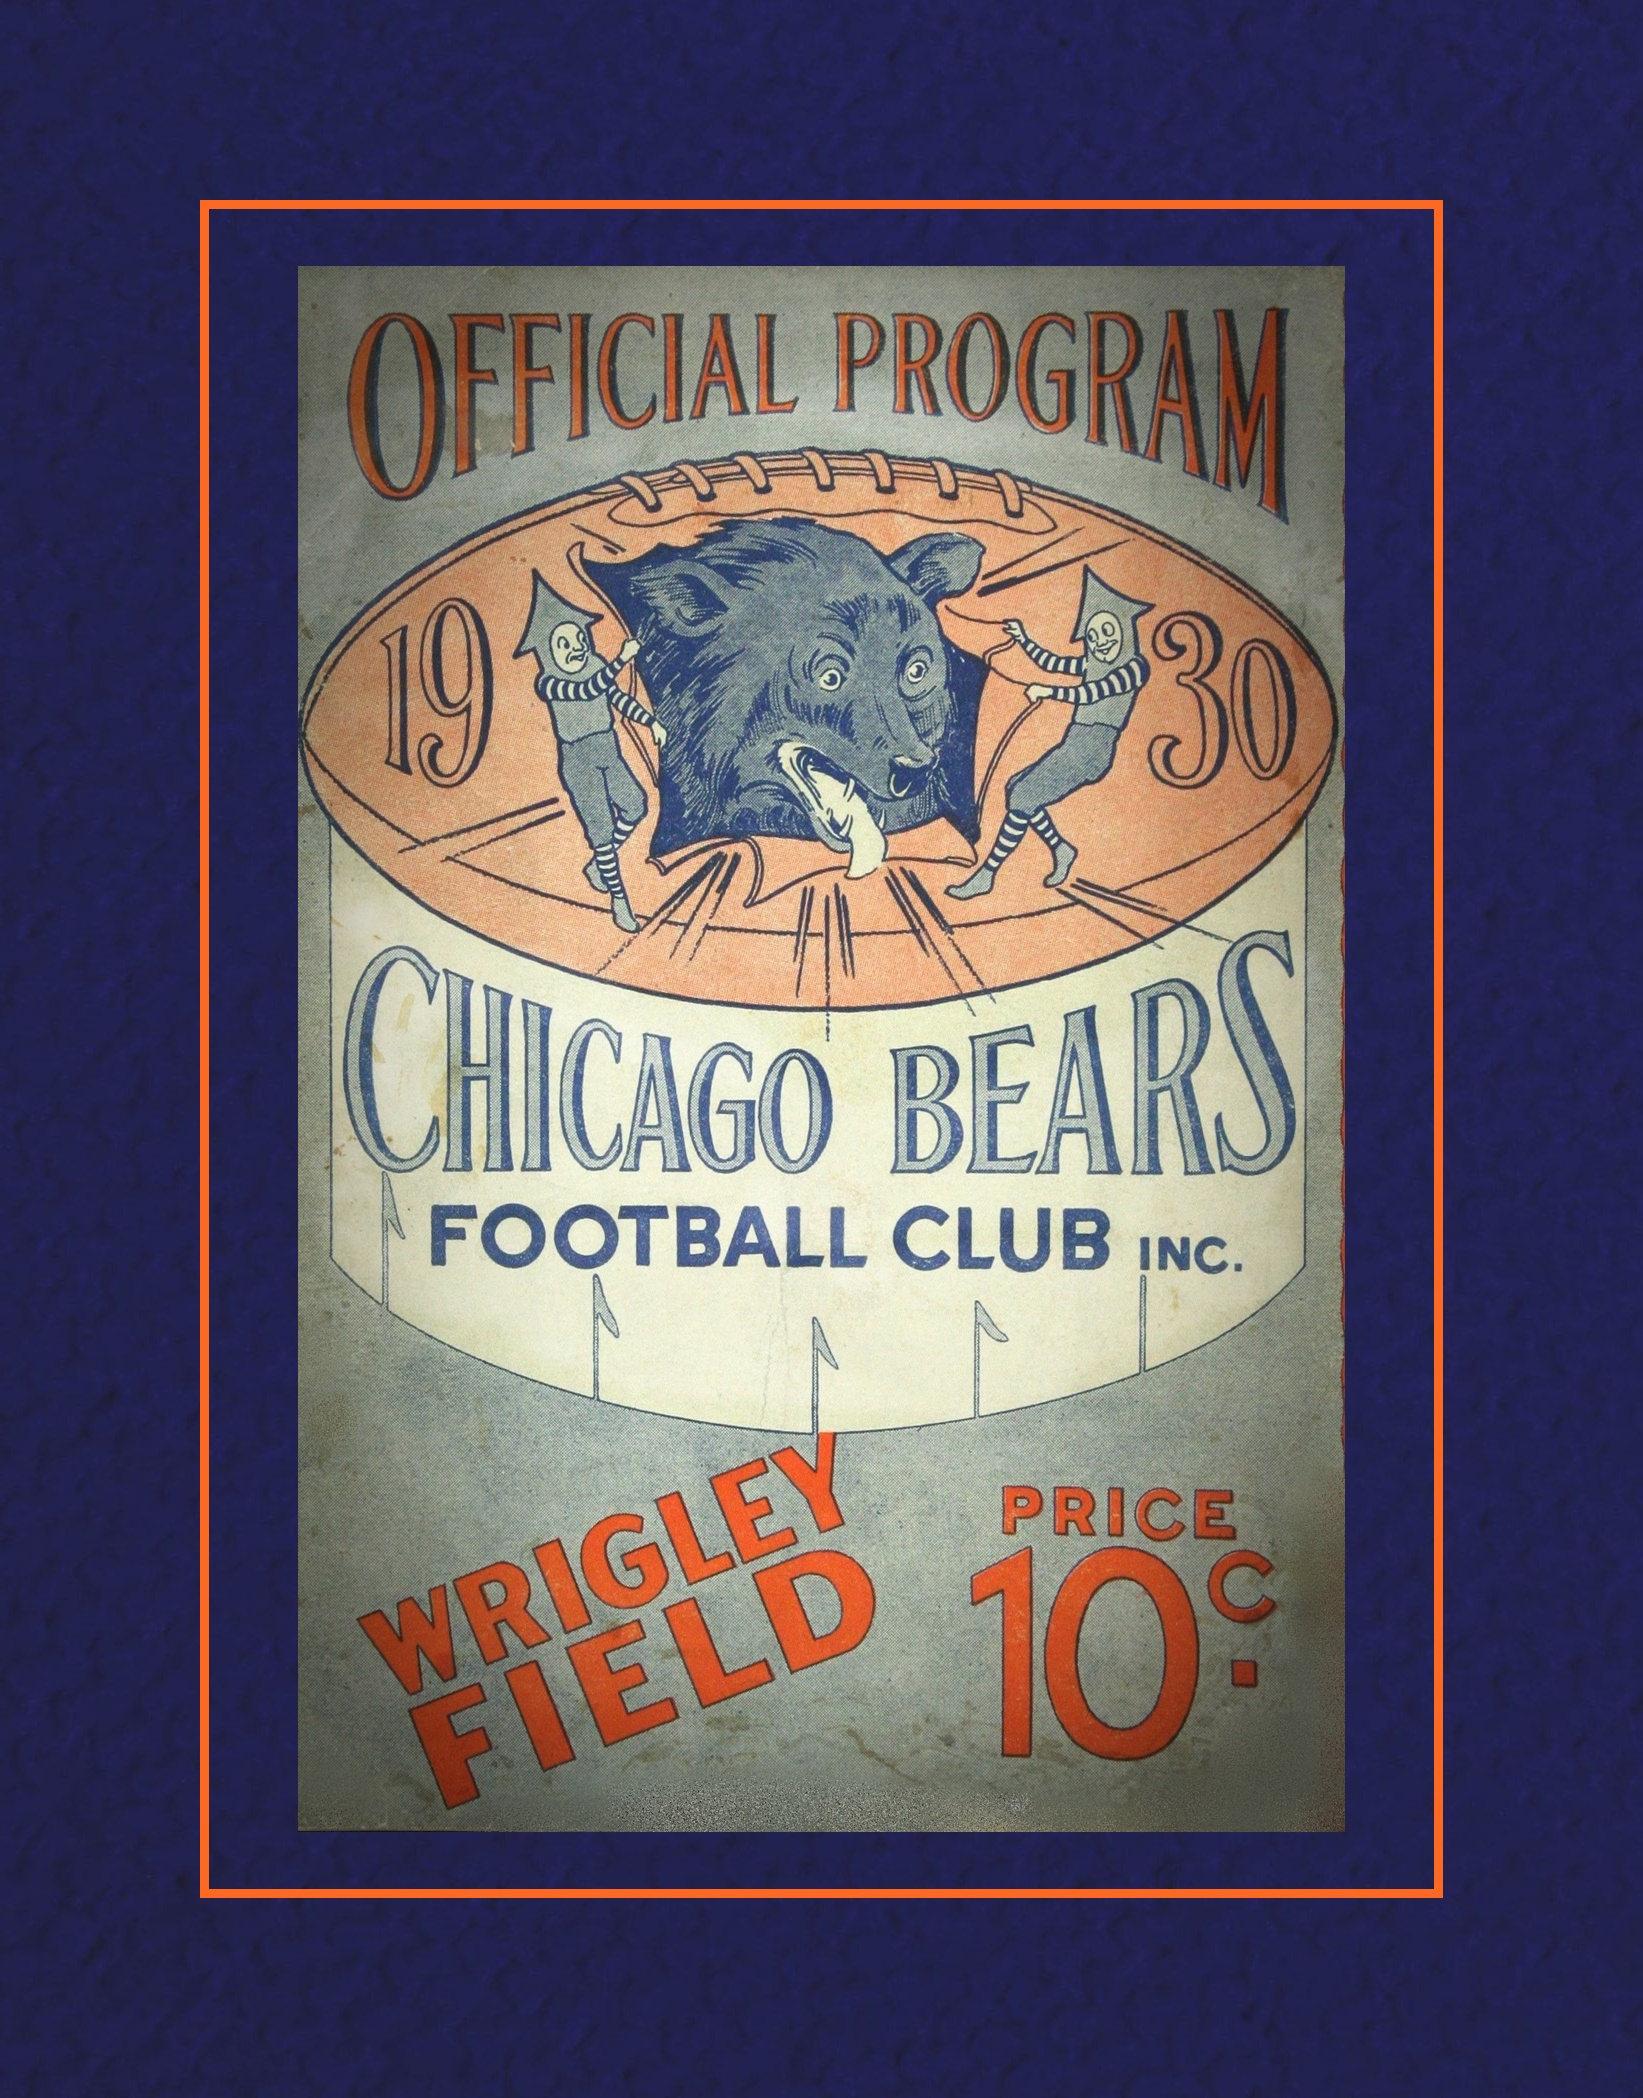 Arleyart vintage 1930 chicago bears wall decor football arleyart vintage 1930 chicago bears wall decor football program cover art poster nfl fan wall decor gift amipublicfo Choice Image